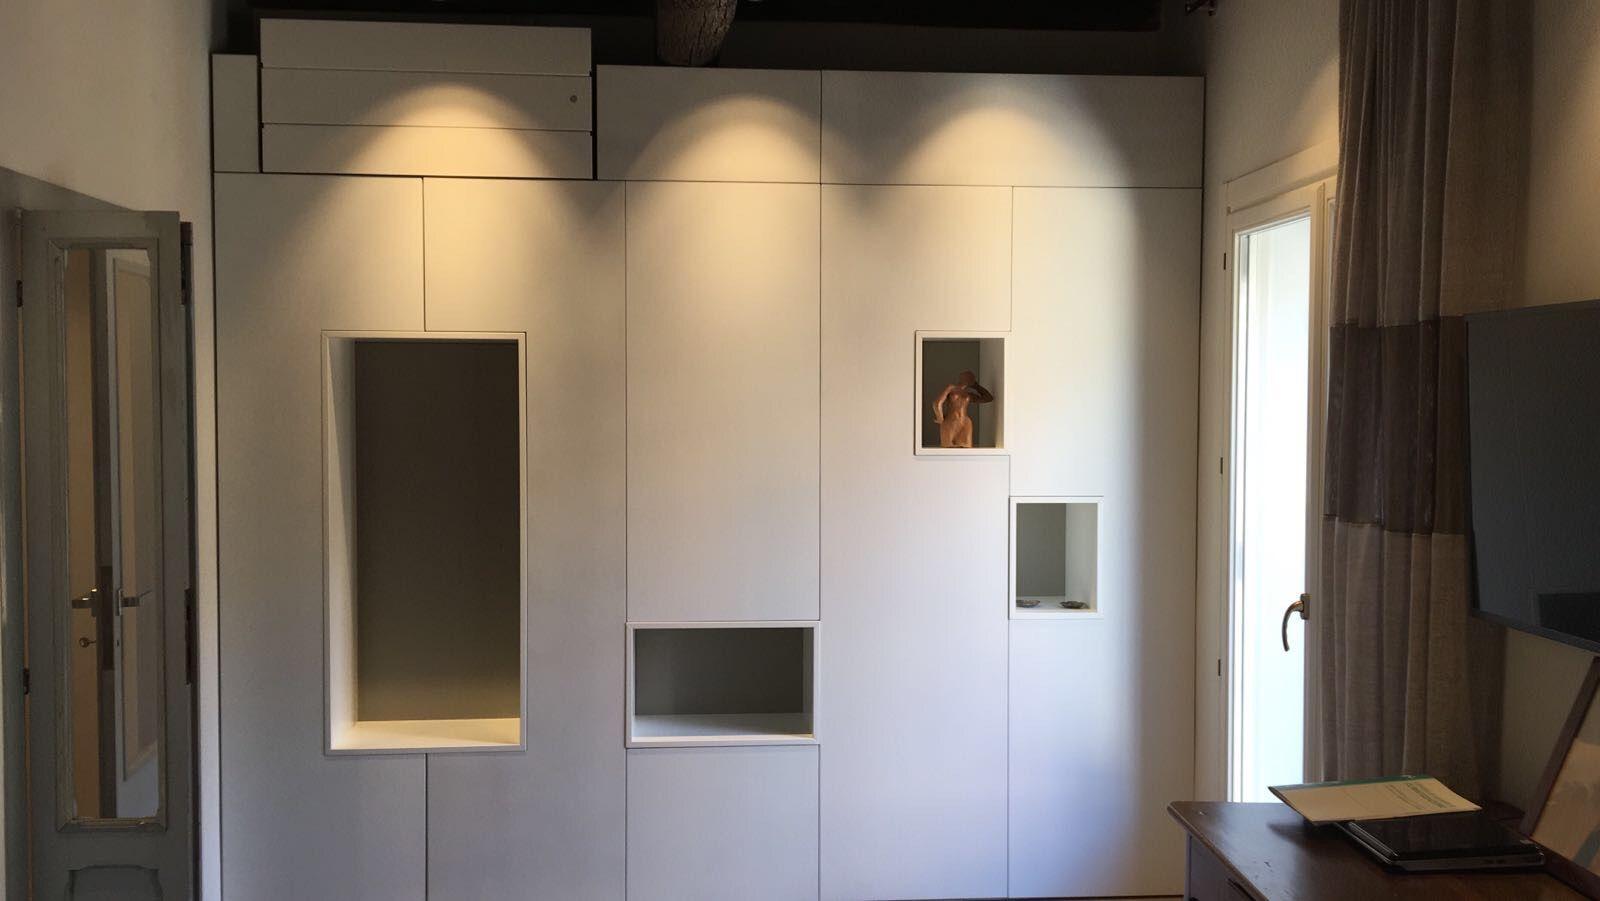 Bedroom interior design with almirah my project ornella matassoli imprinting  furniture ideas  pinterest